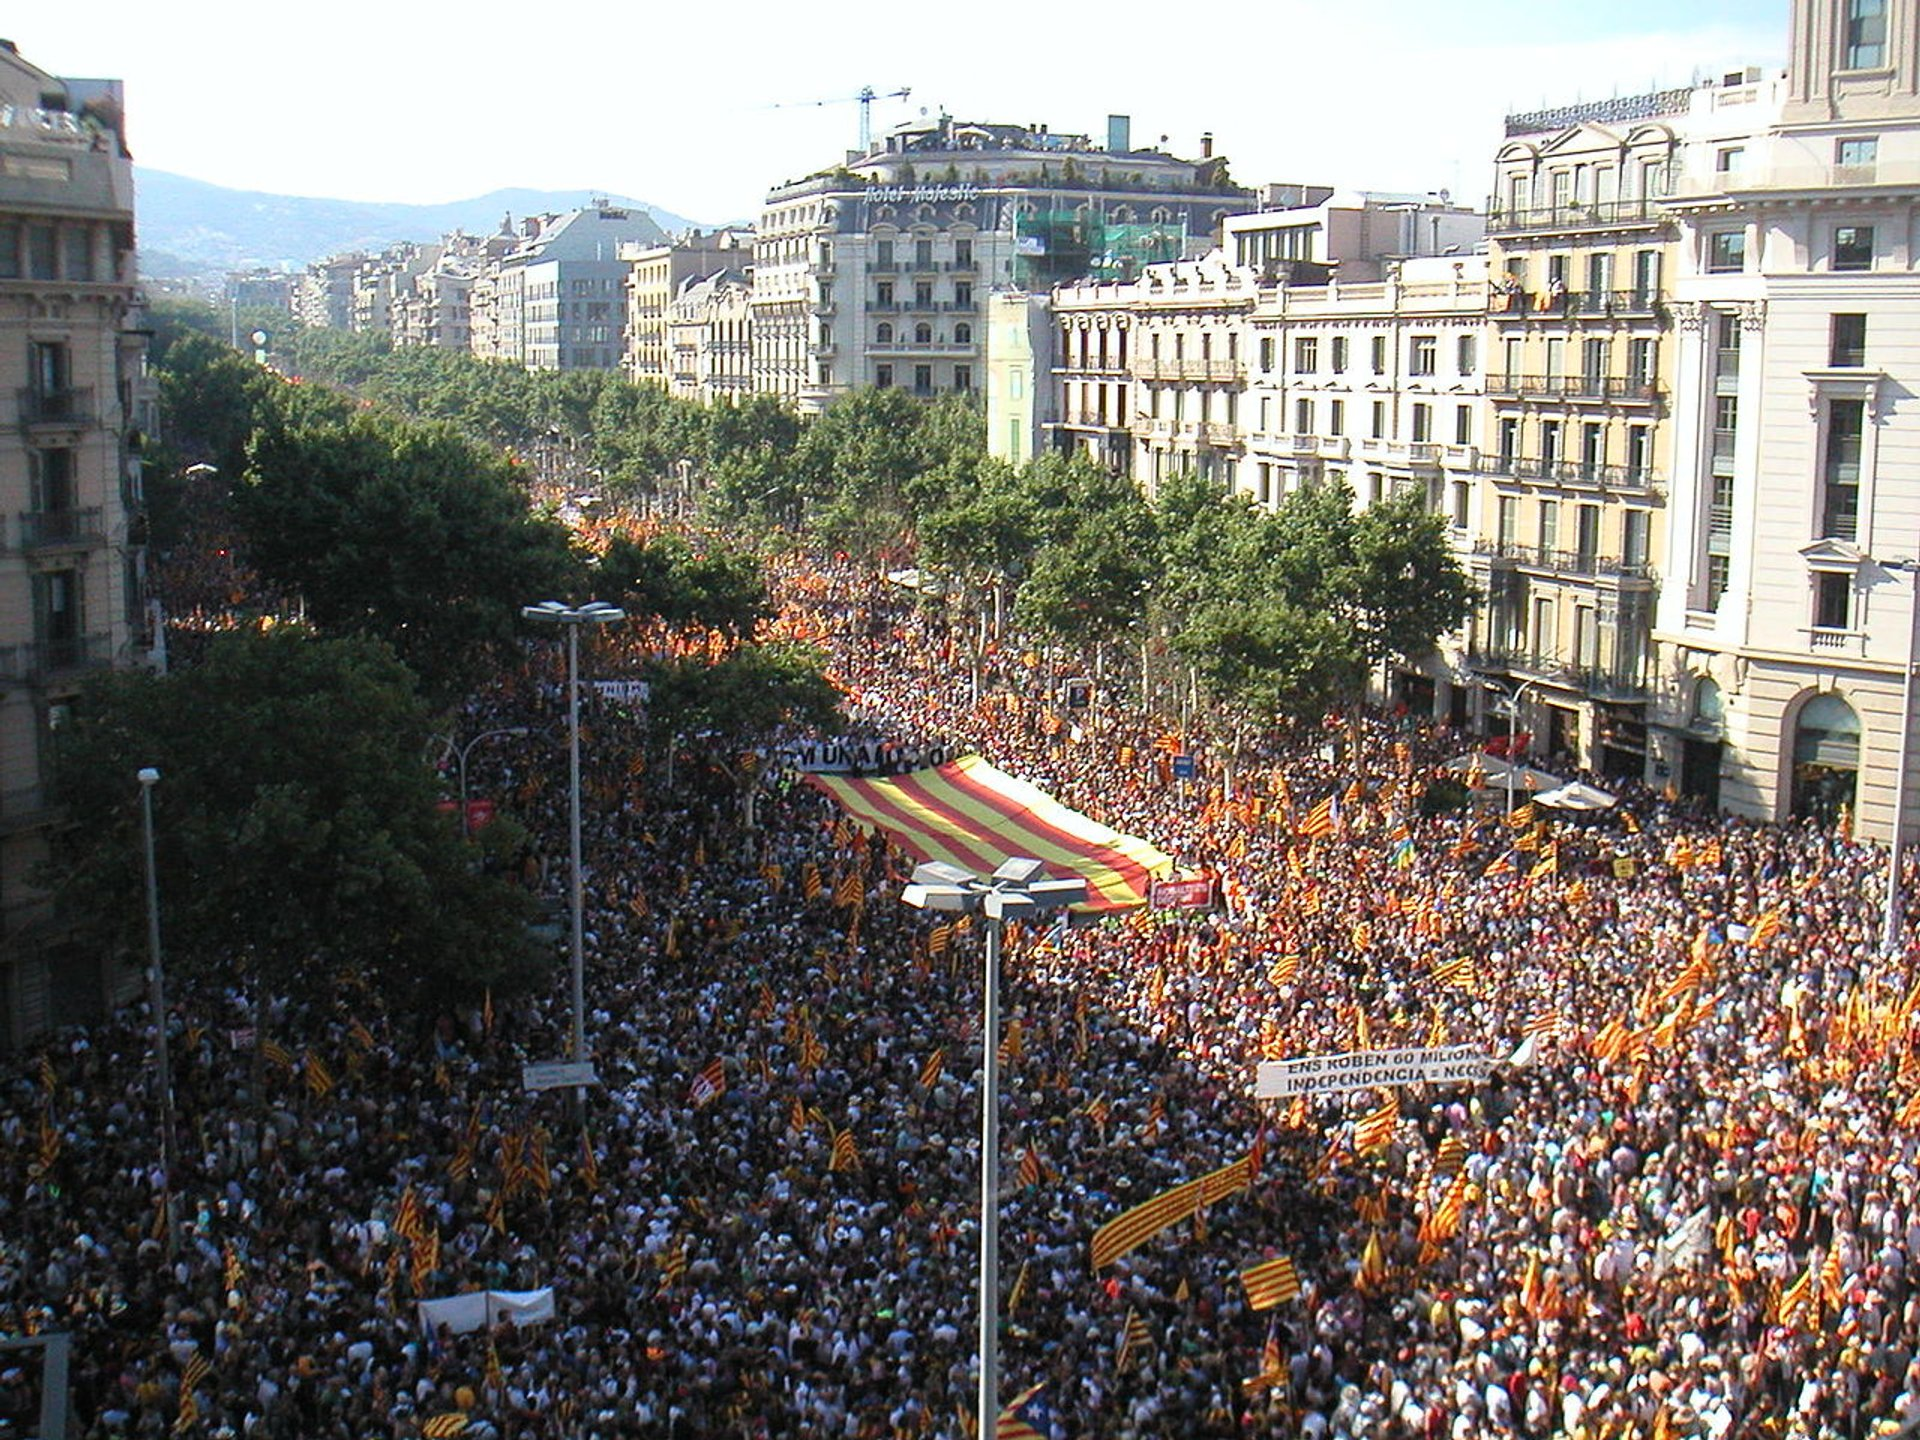 Diada Nacional de Catalunya in Barcelona - Best Season 2019